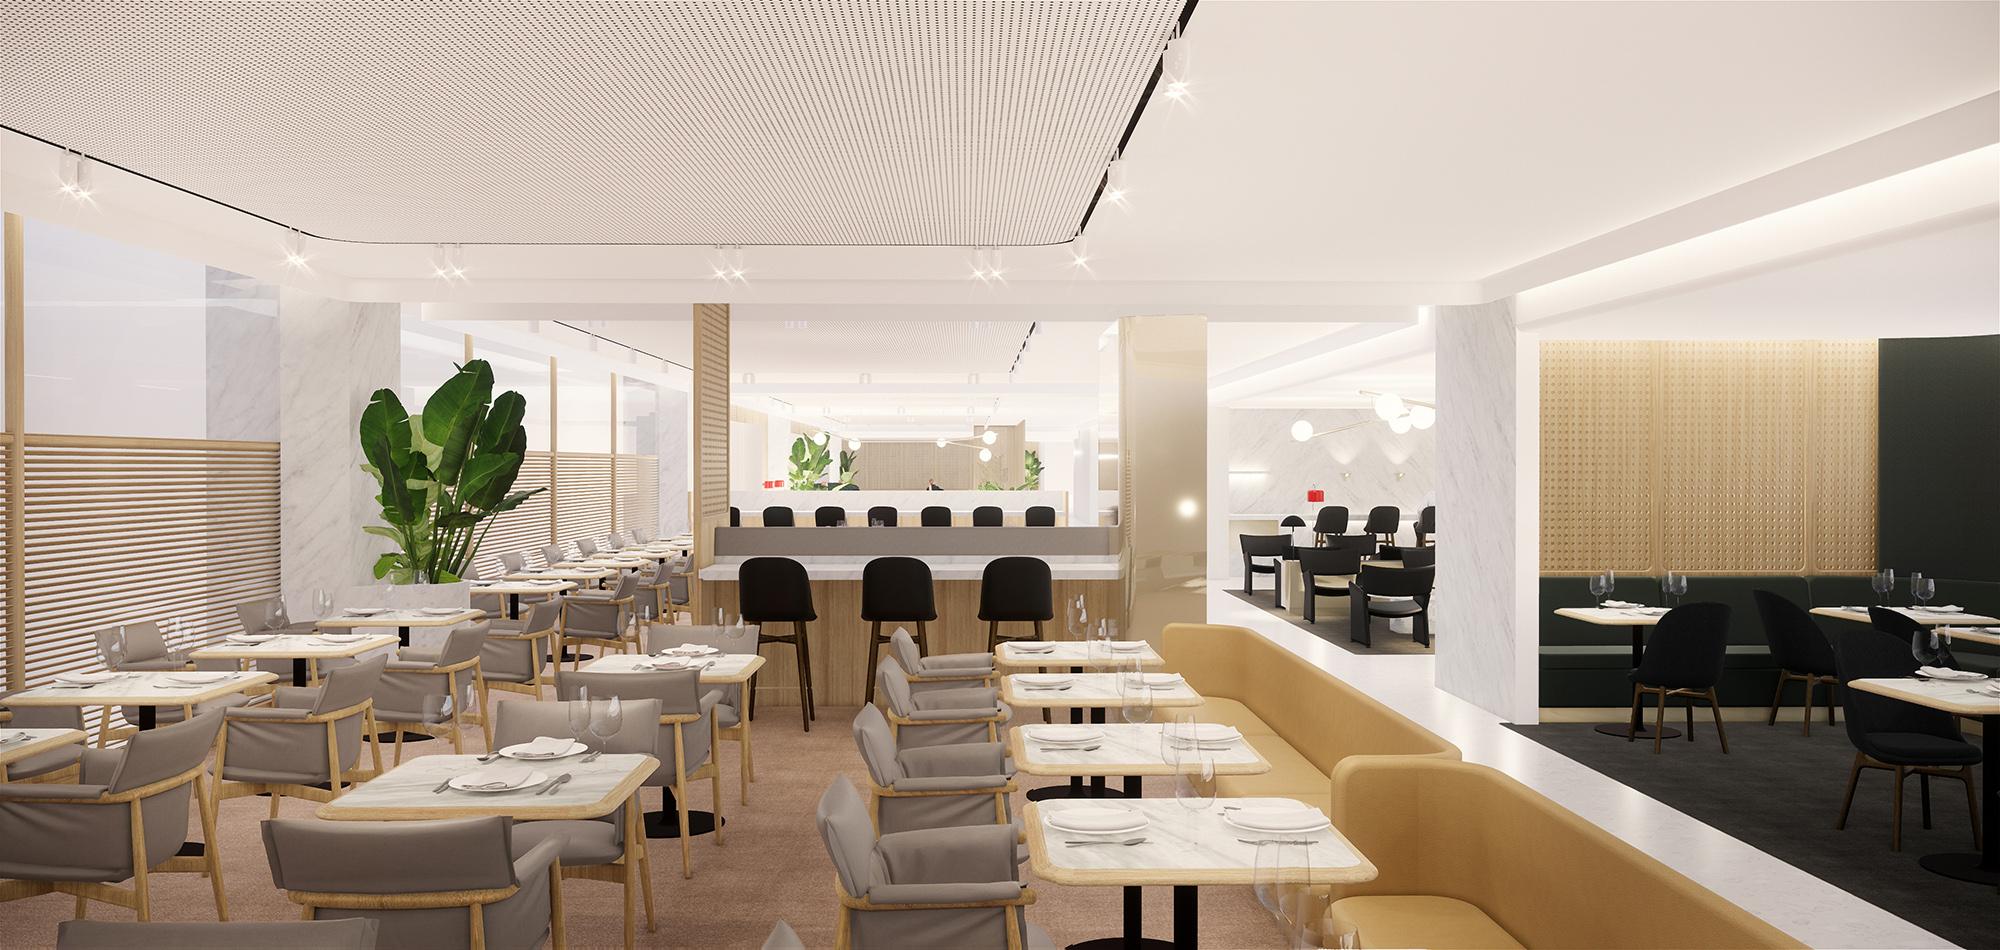 Dining (Qantas).jpg